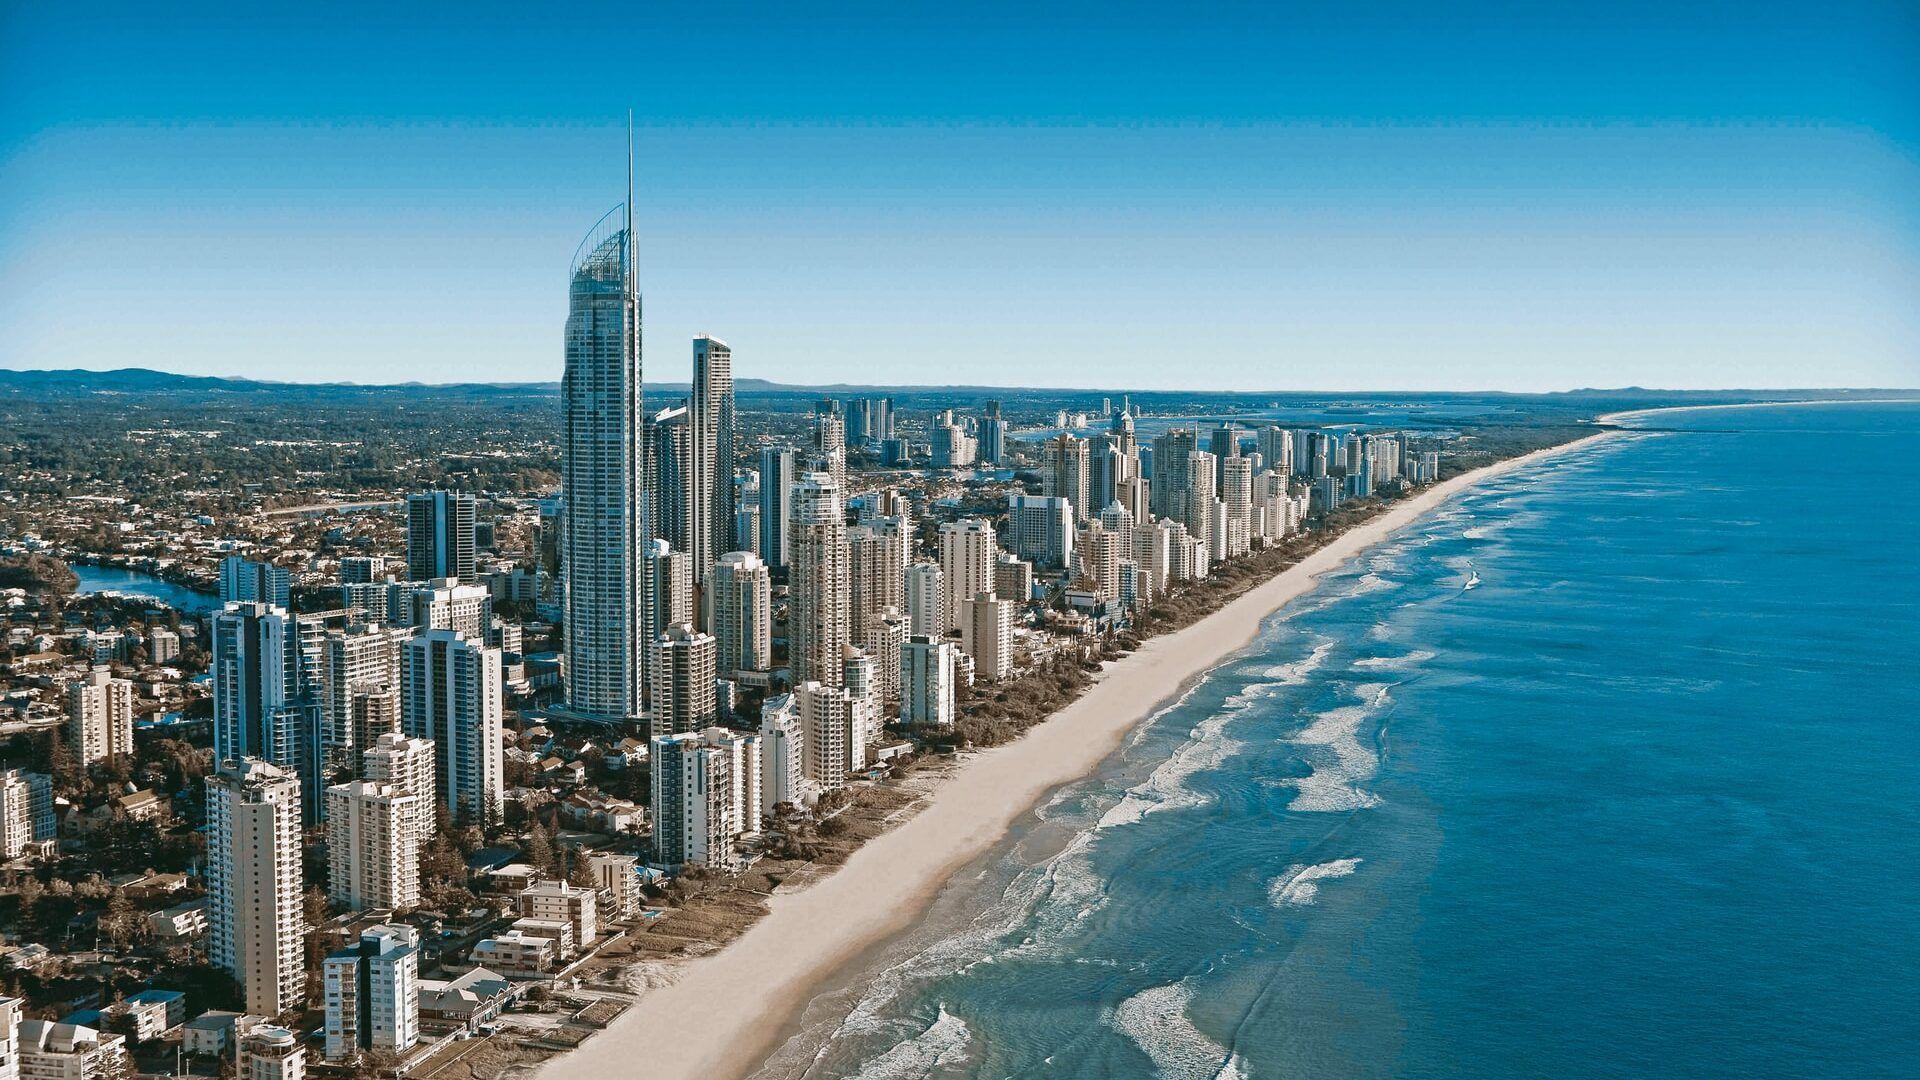 10 Wisata Gold Coast Australia Terbaik